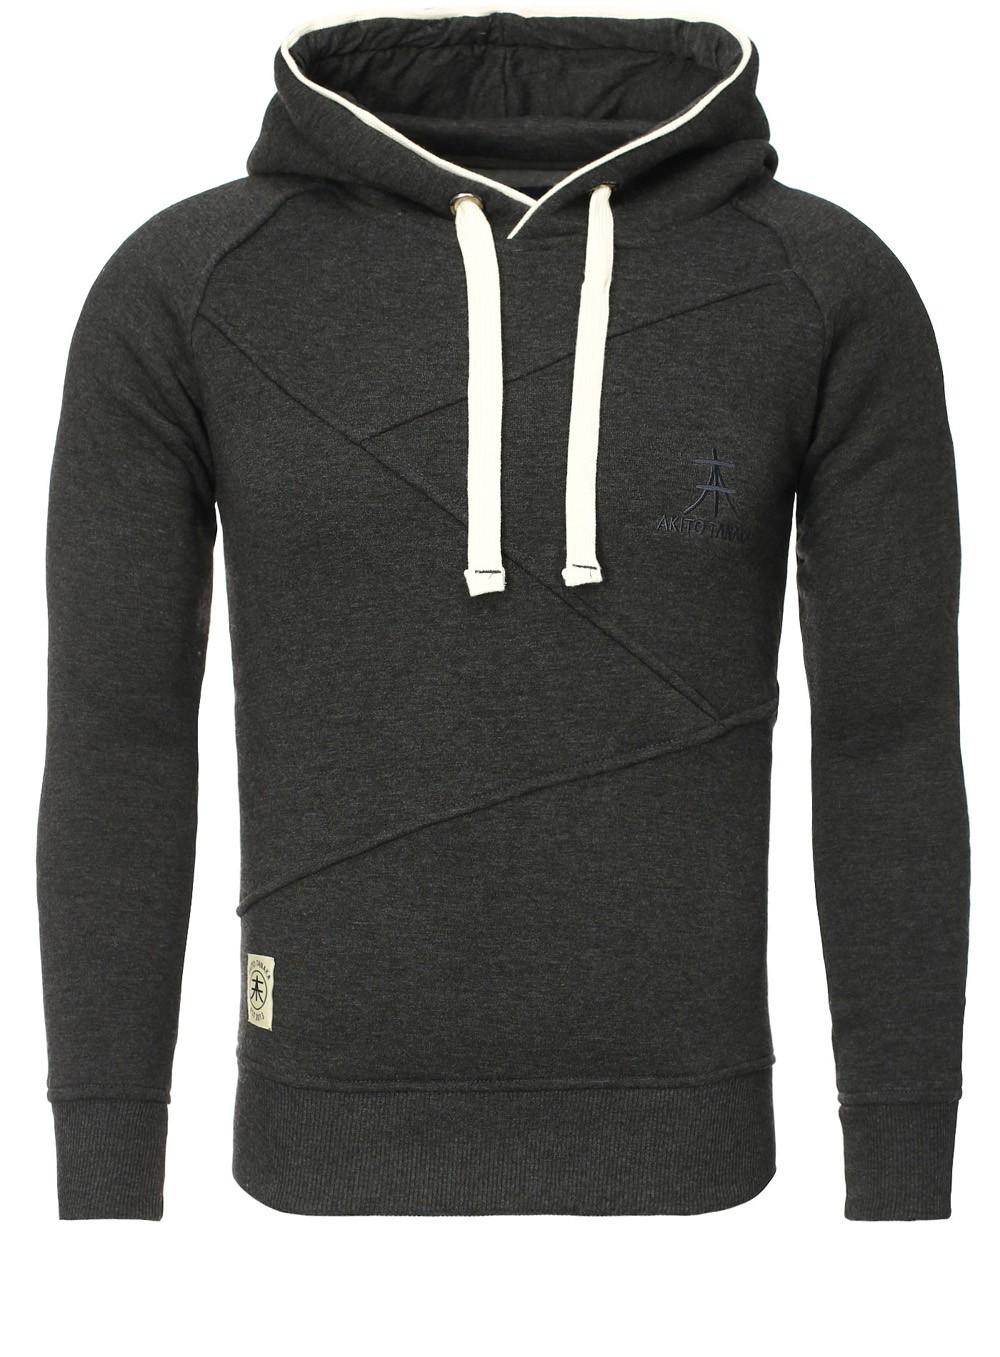 akito tanaka herren sweatshirt 18103 sweater pullover mit kapuze. Black Bedroom Furniture Sets. Home Design Ideas